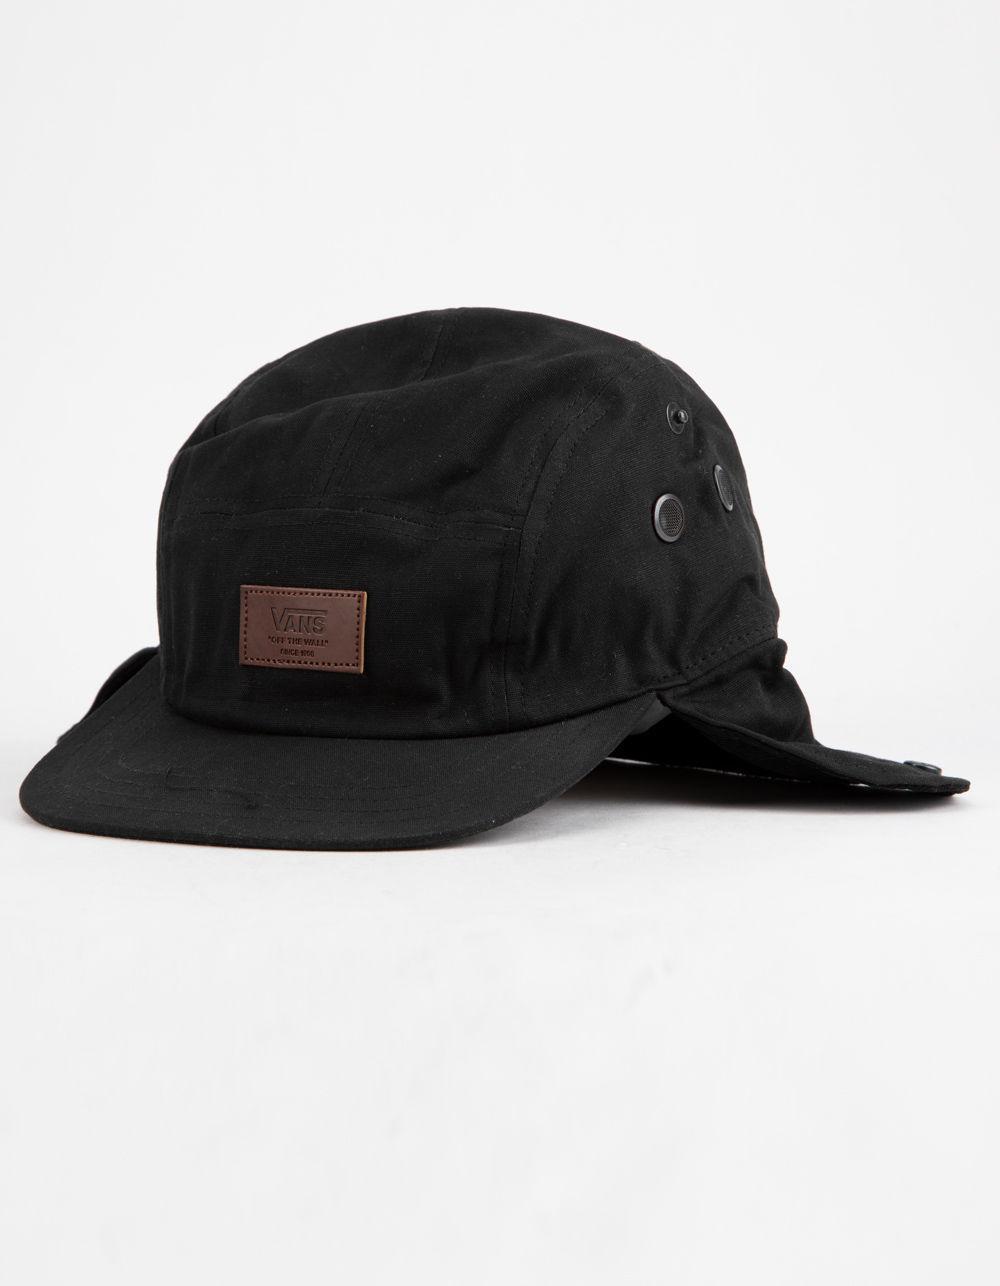 Lyst - Vans Flap 5-panel Mens Camper Hat in Black for Men f735ec32b1c